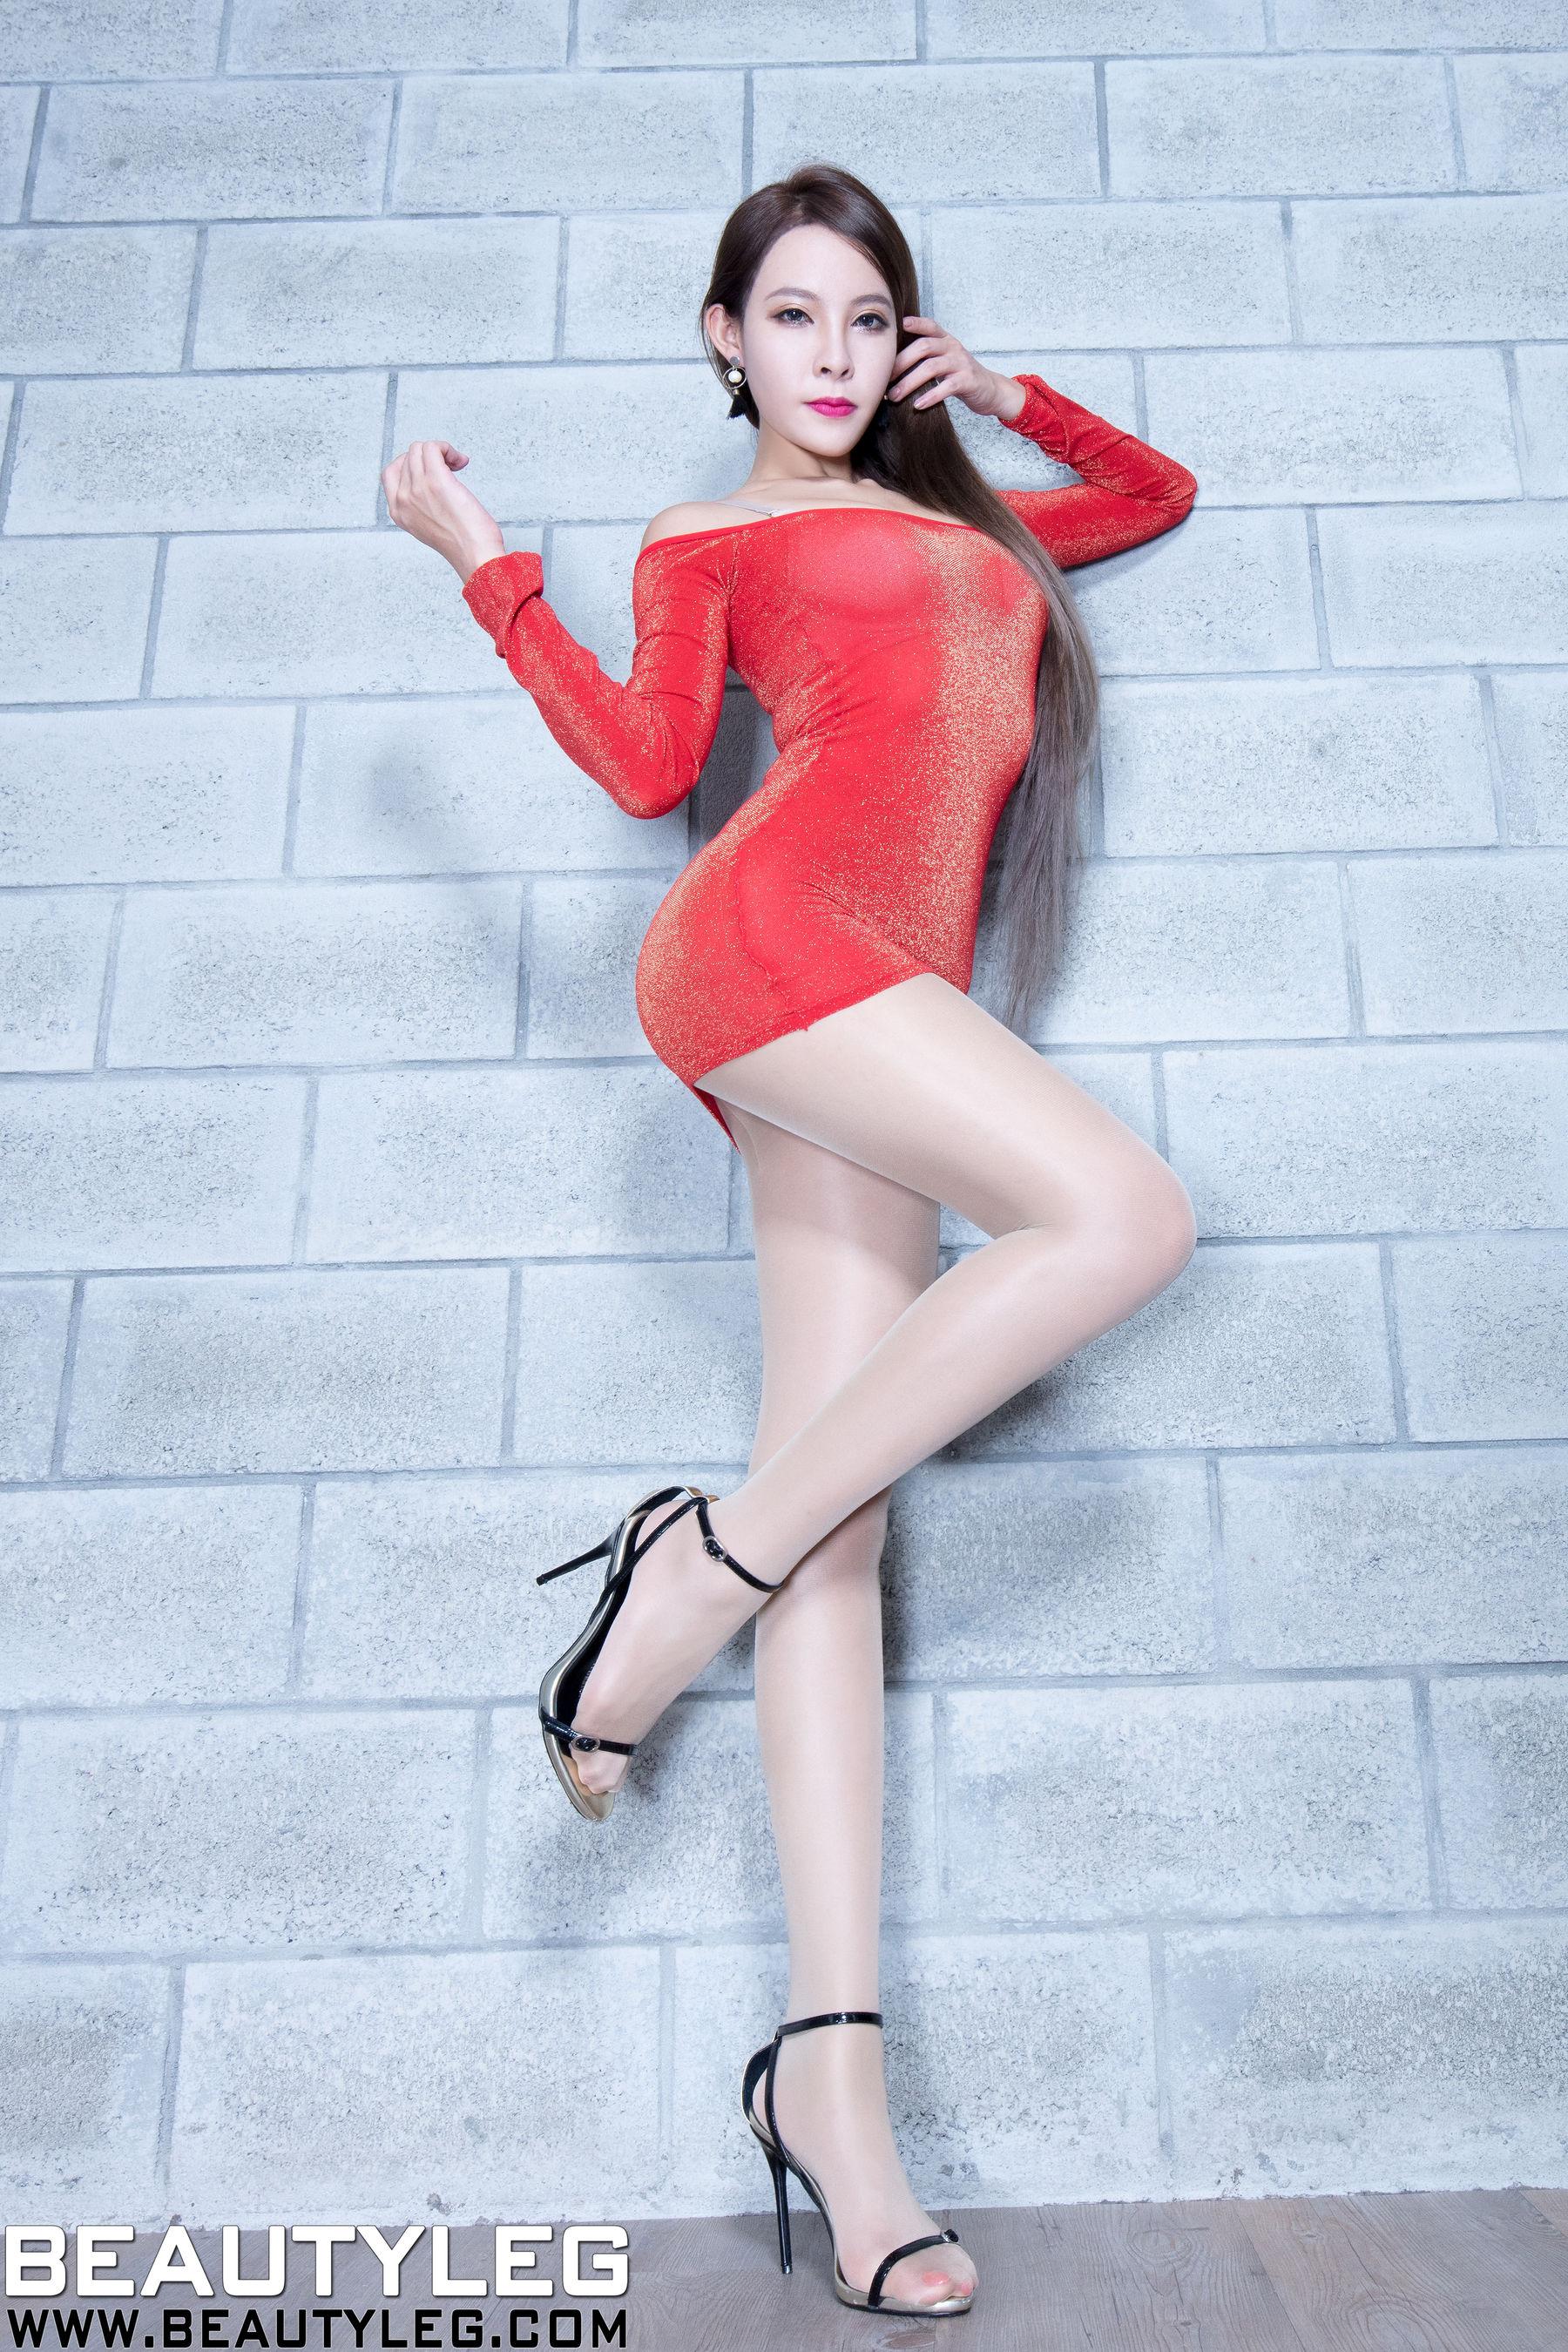 VOL.89 [Beautyleg]丝袜美女高跟美腿长腿美女:翁雨澄(腿模Aileen)超高清个人性感漂亮大图(50P)